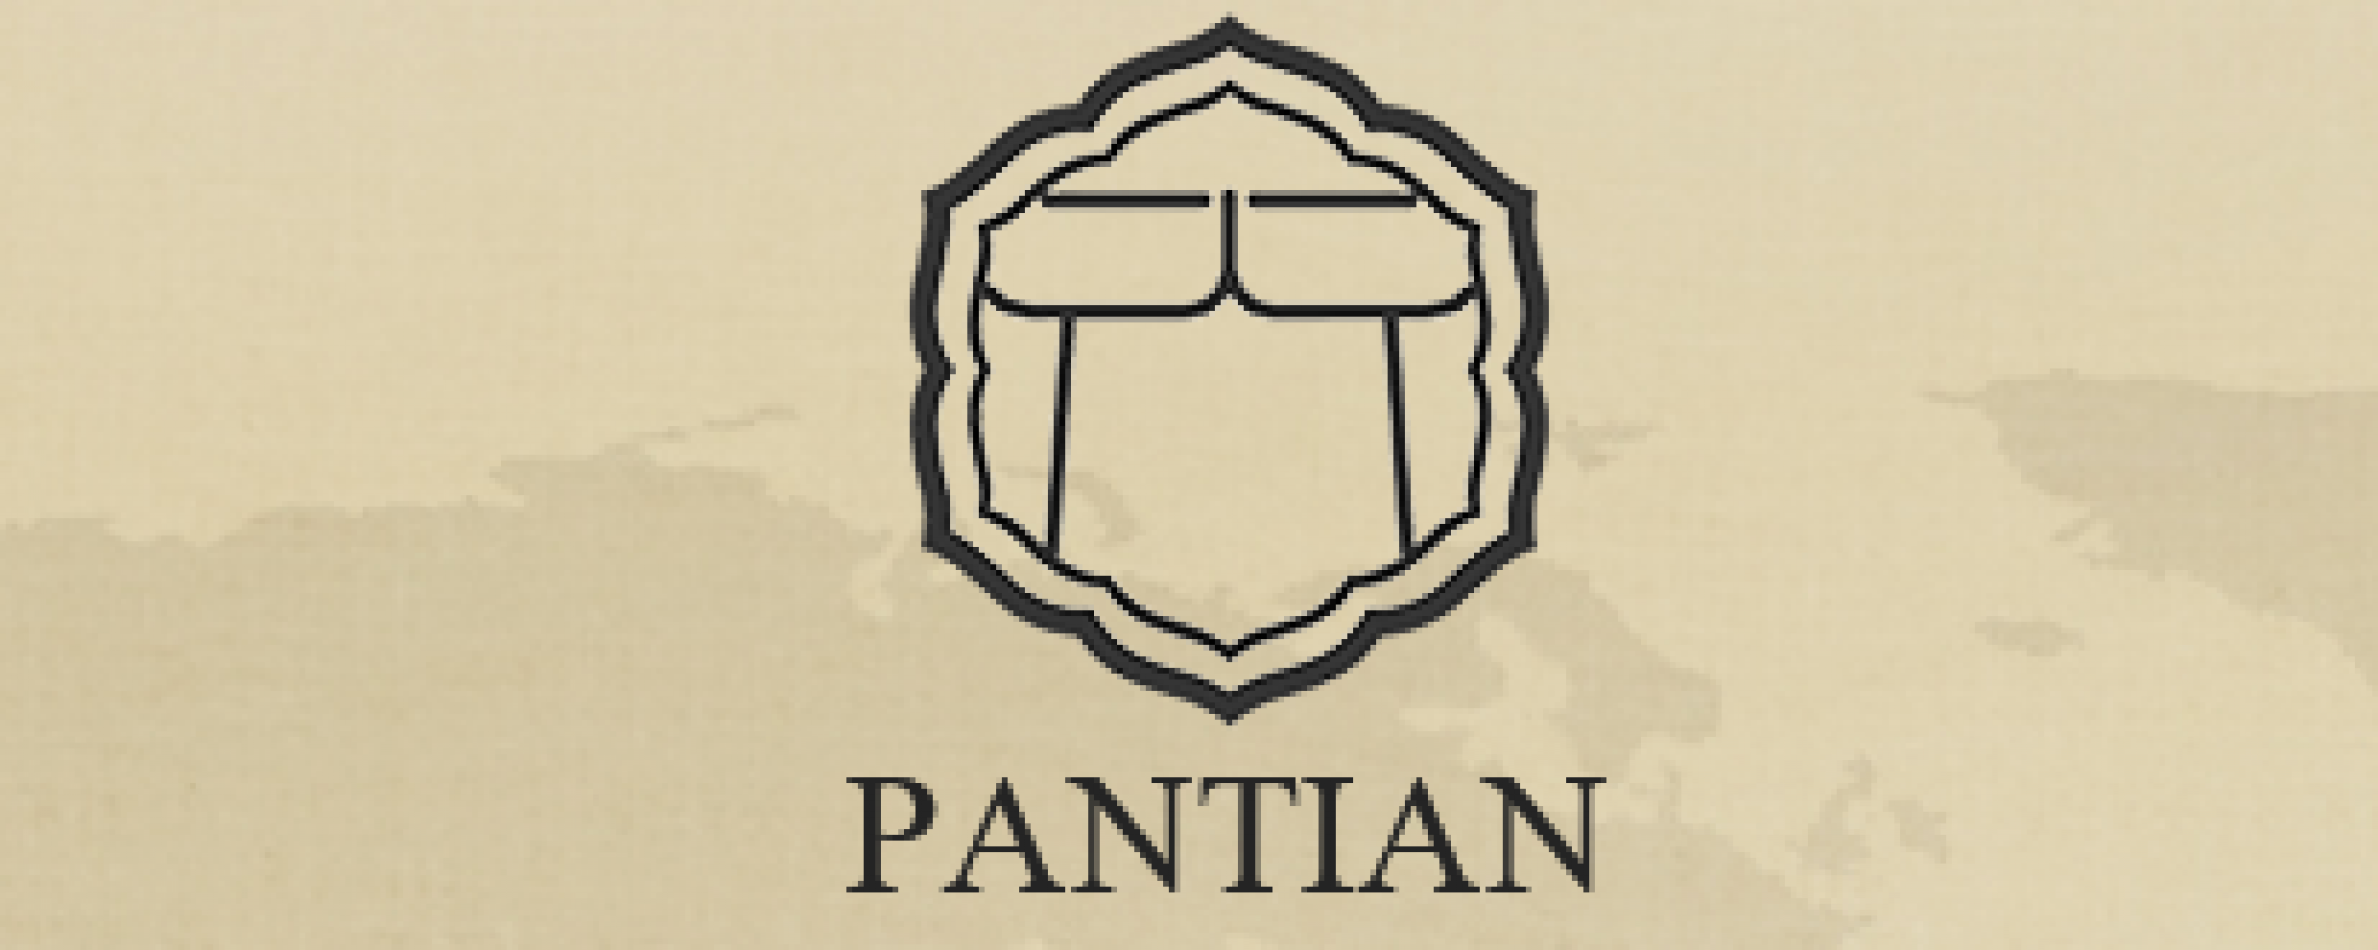 SHAOXING PANTIAN CHEMICAL FIBER CO.,LTD